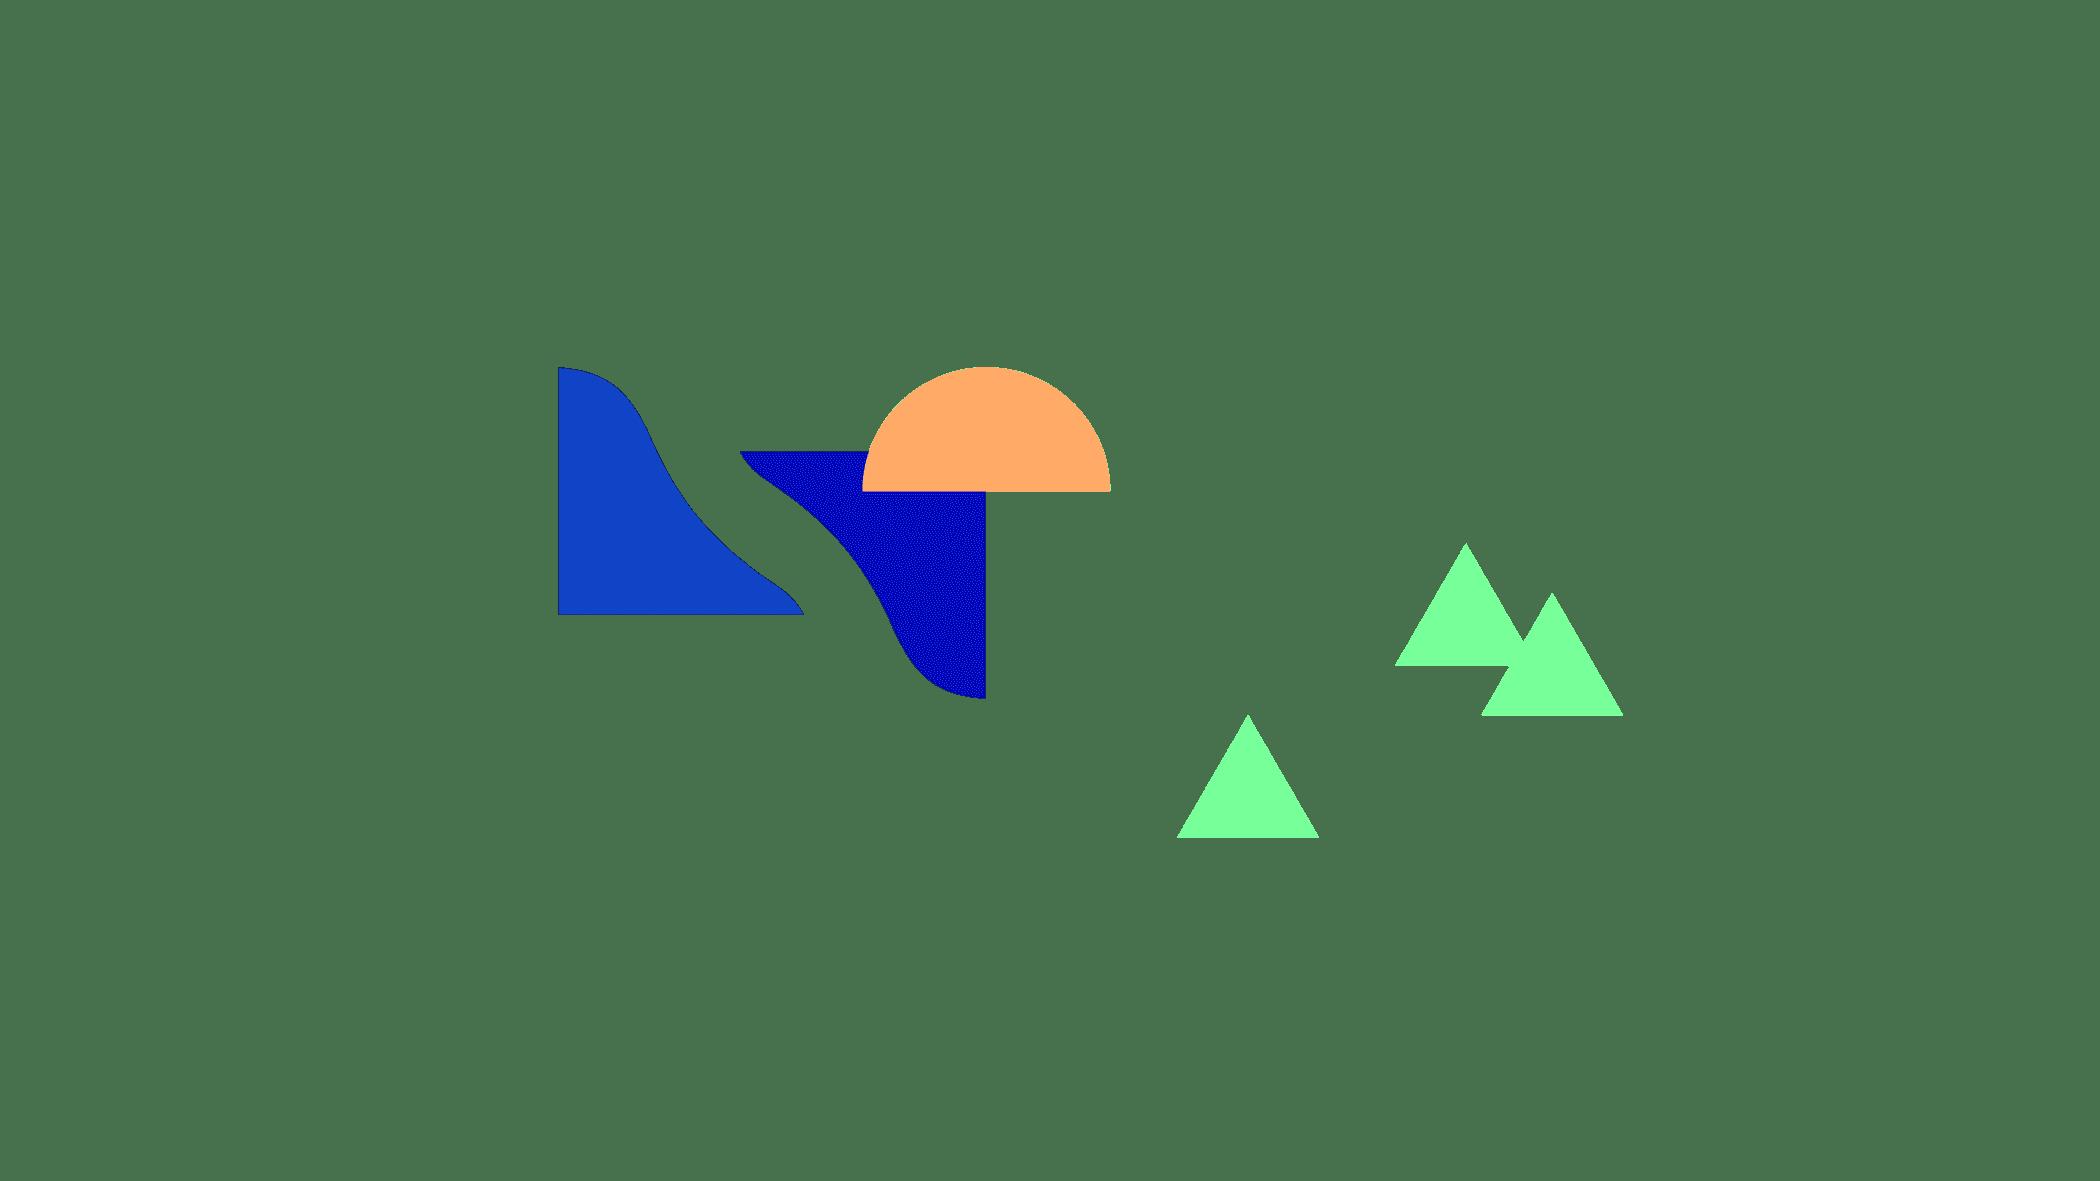 Gesture, Triangle